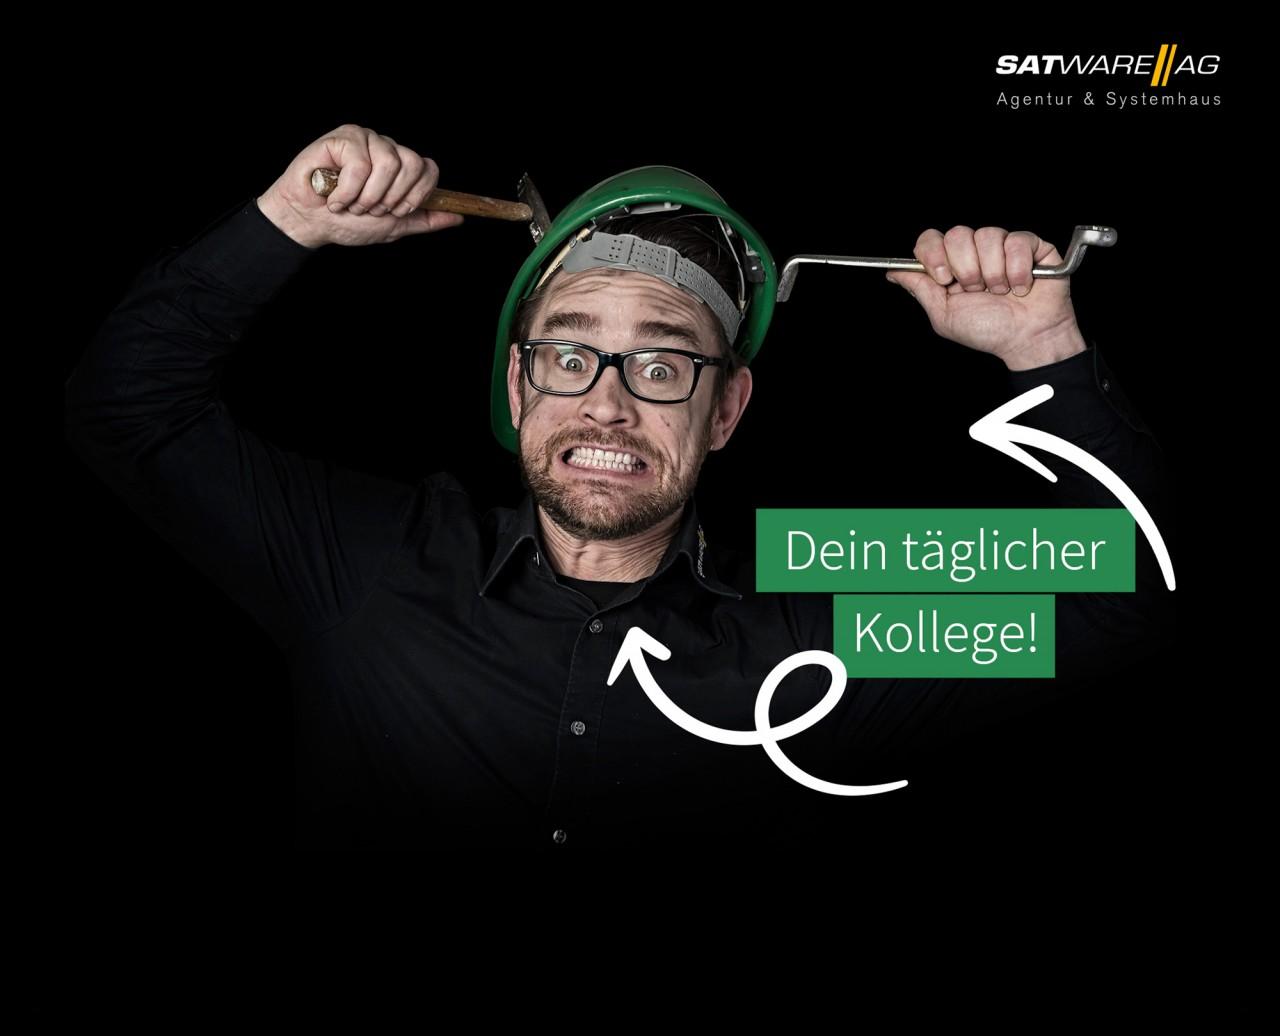 IT_Experte